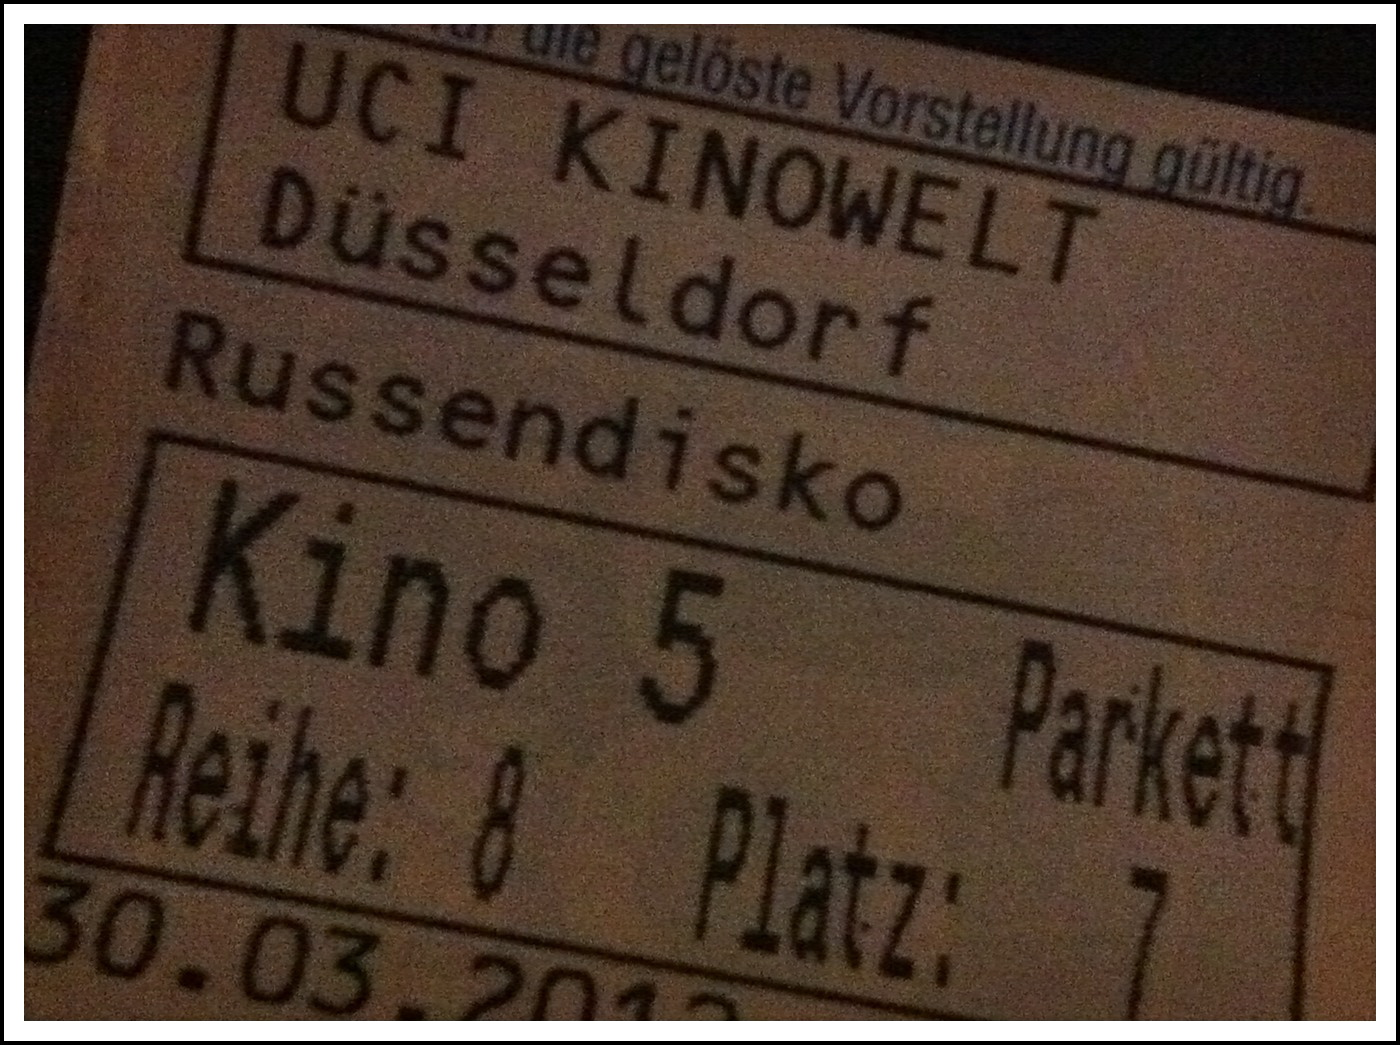 Russendisko Köln